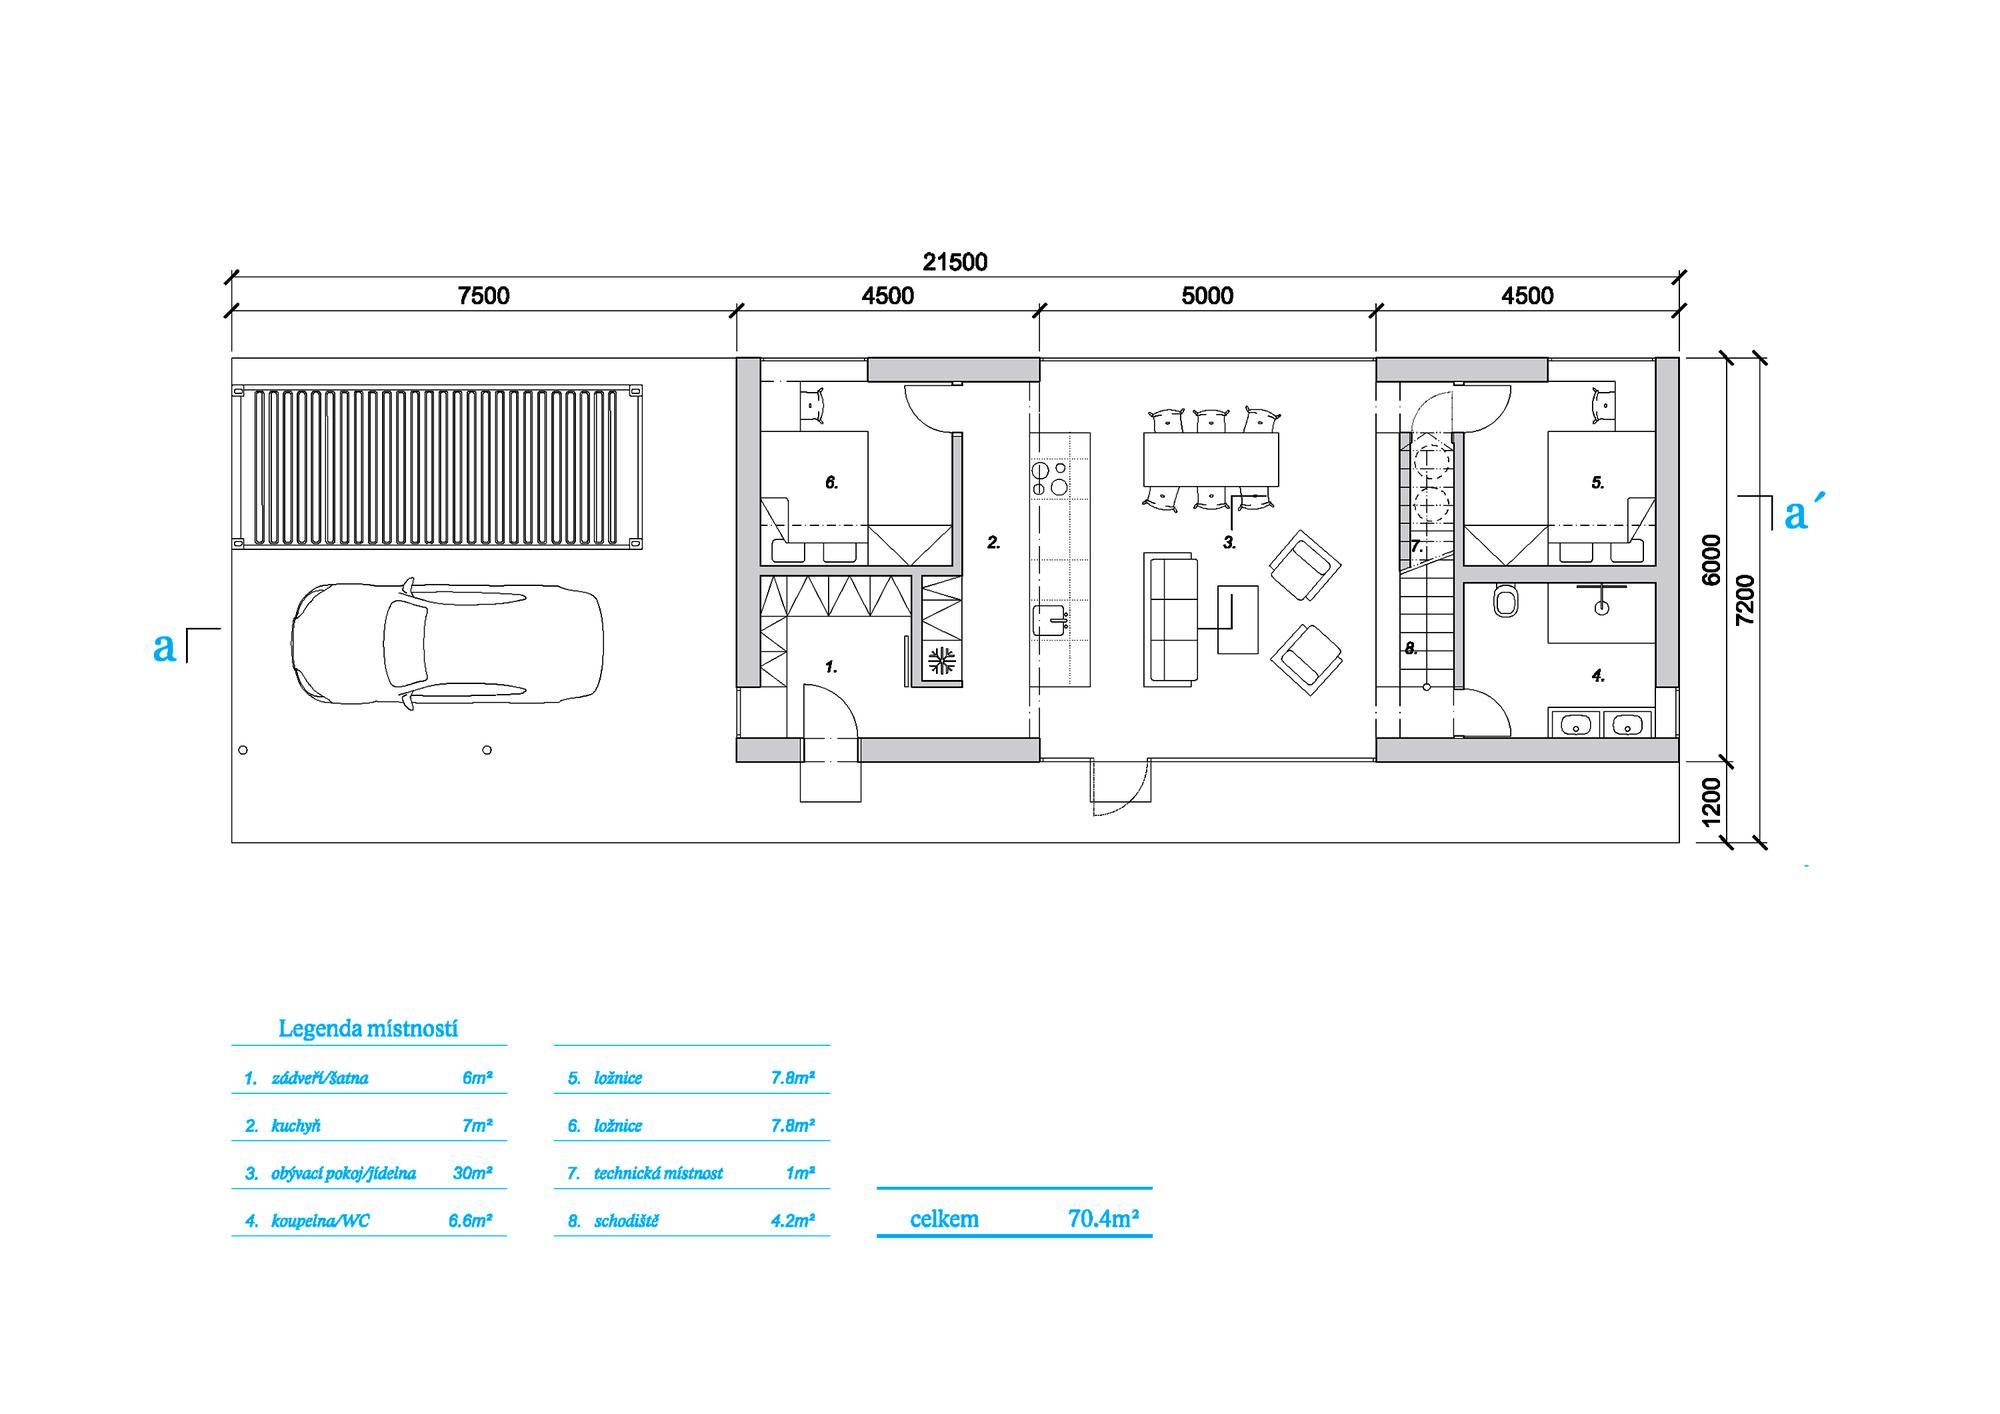 Gallery of The Fence House / Mj\u00f6lk architekti - 13